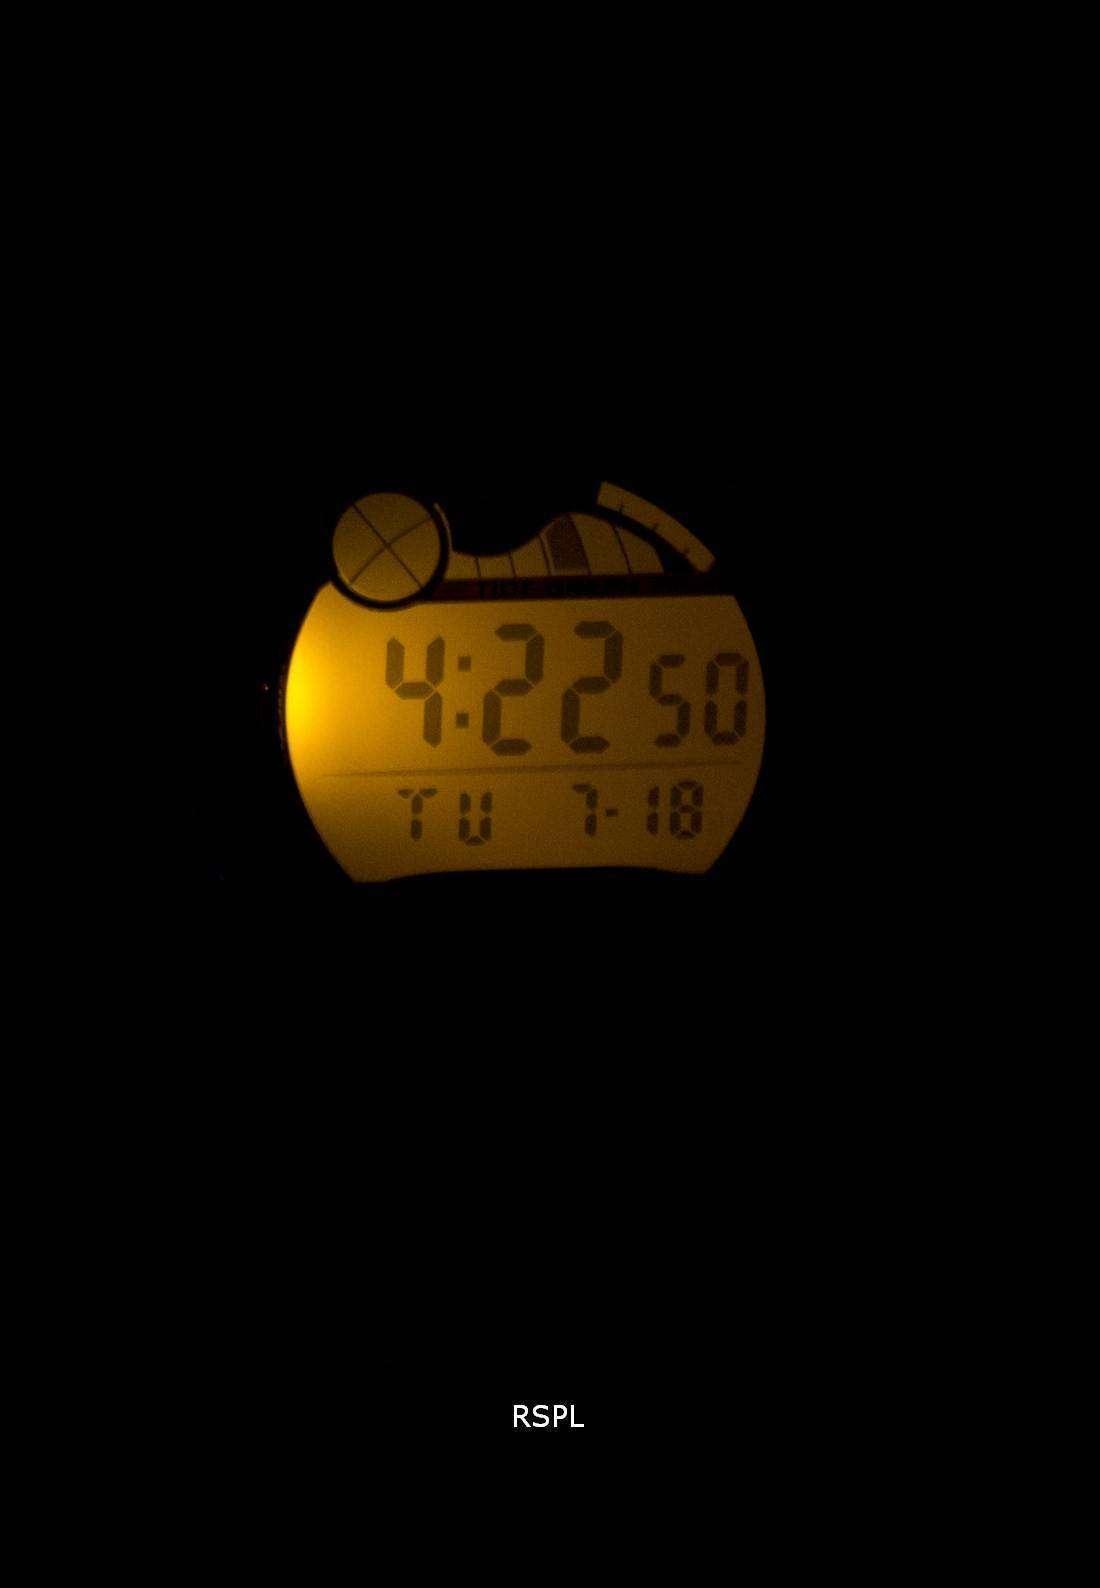 6767d73c8178 Casio Digital deportivo marea gráfico iluminador W-753-3AVDF W-753 ...